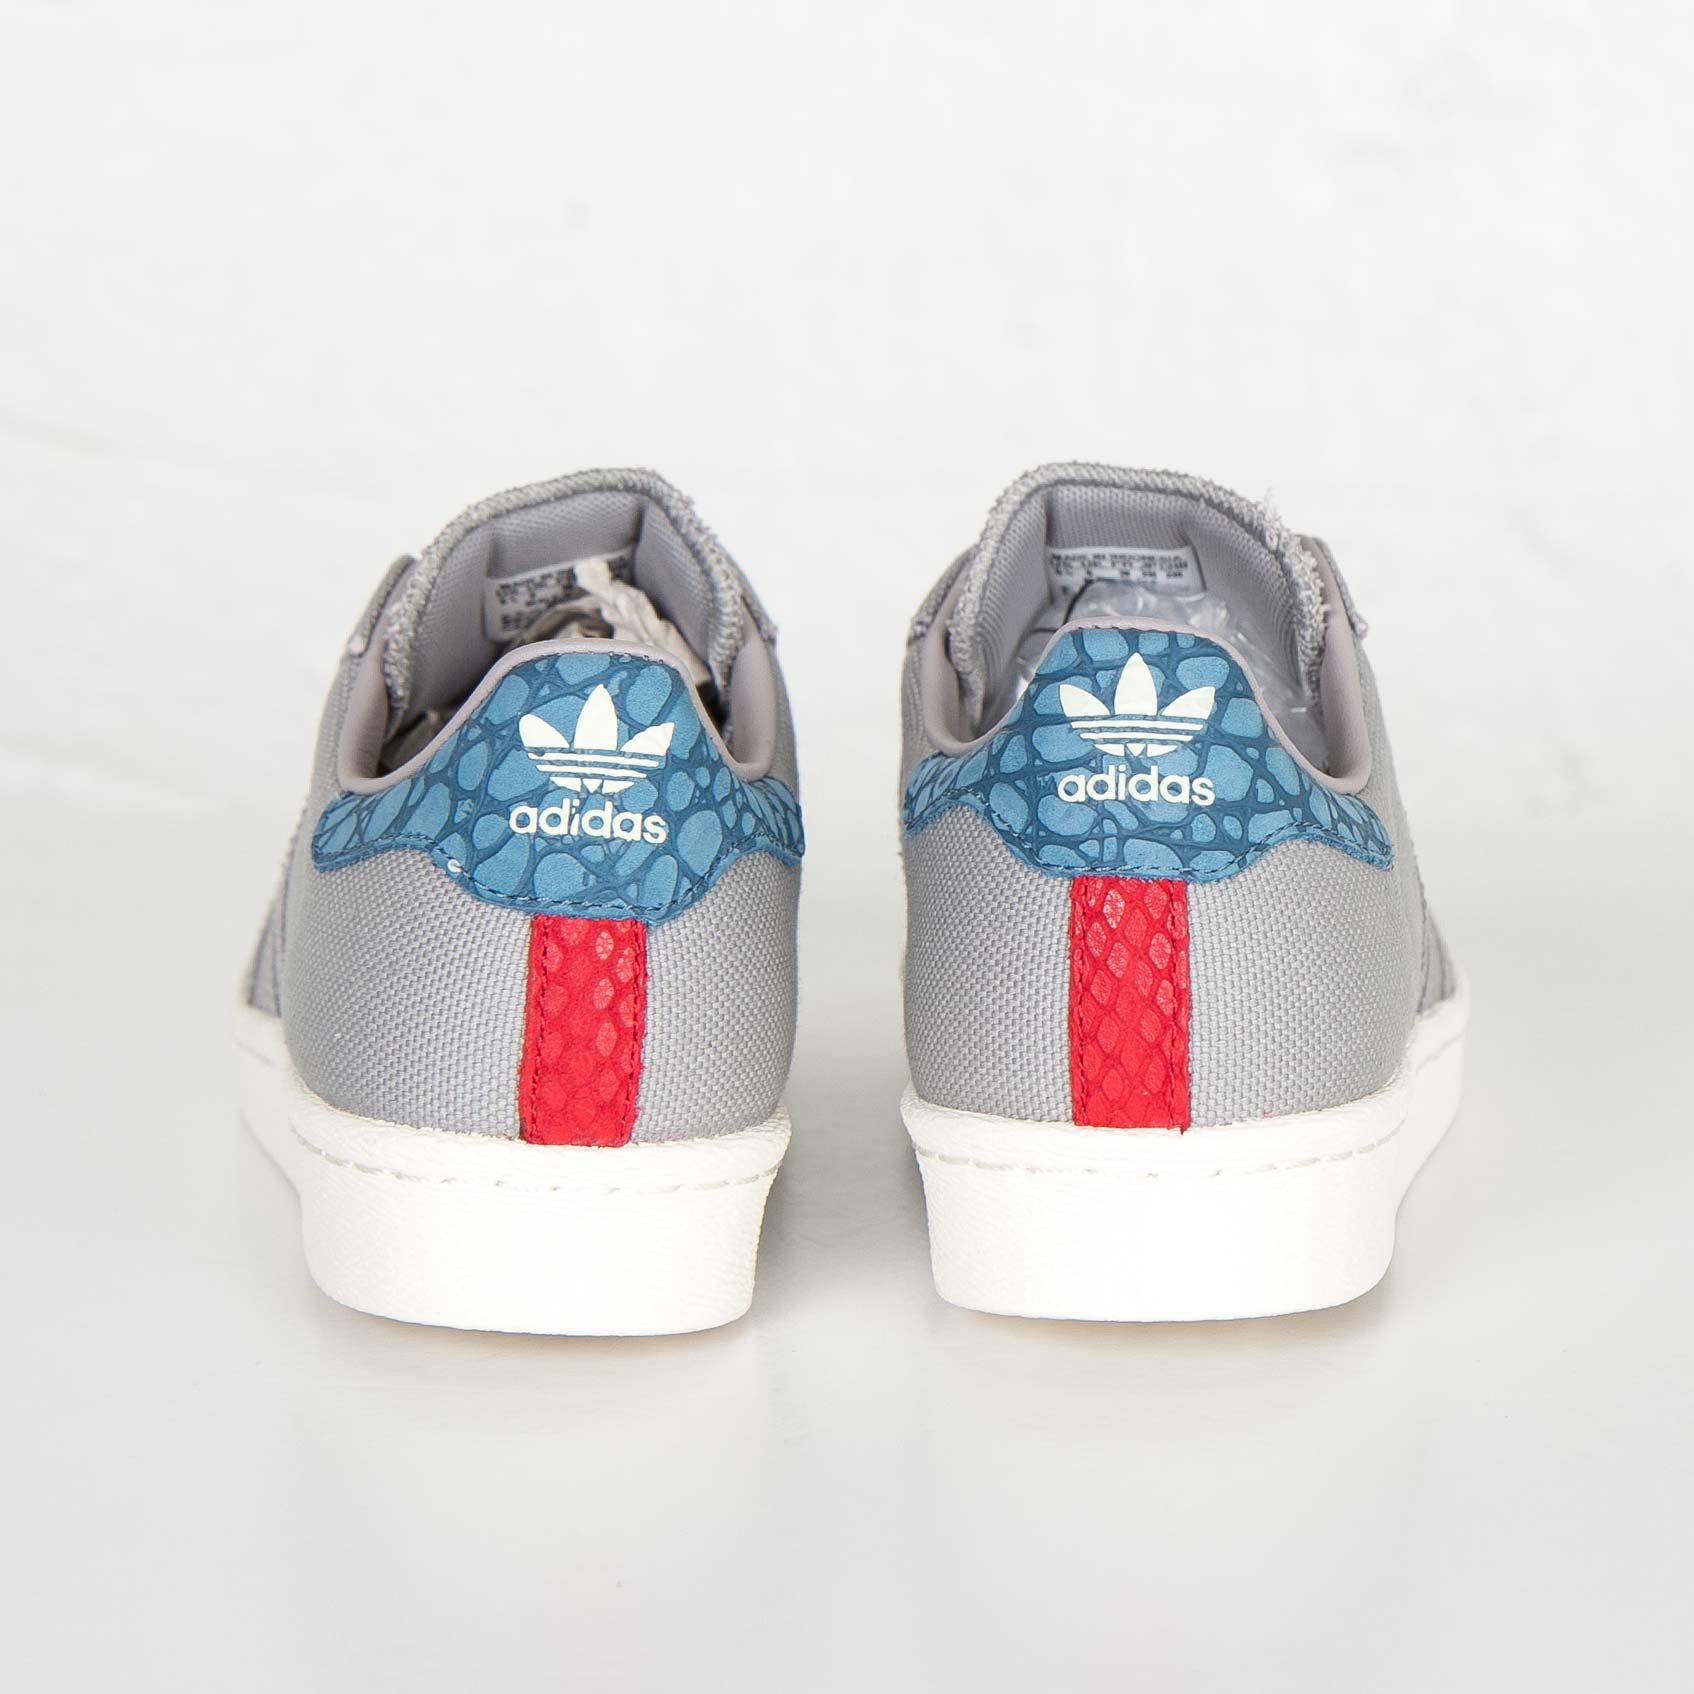 01fe9a2583 adidas Superstar 80s Animal - S75005 - Sneakersnstuff | sneakers &  streetwear online since 1999